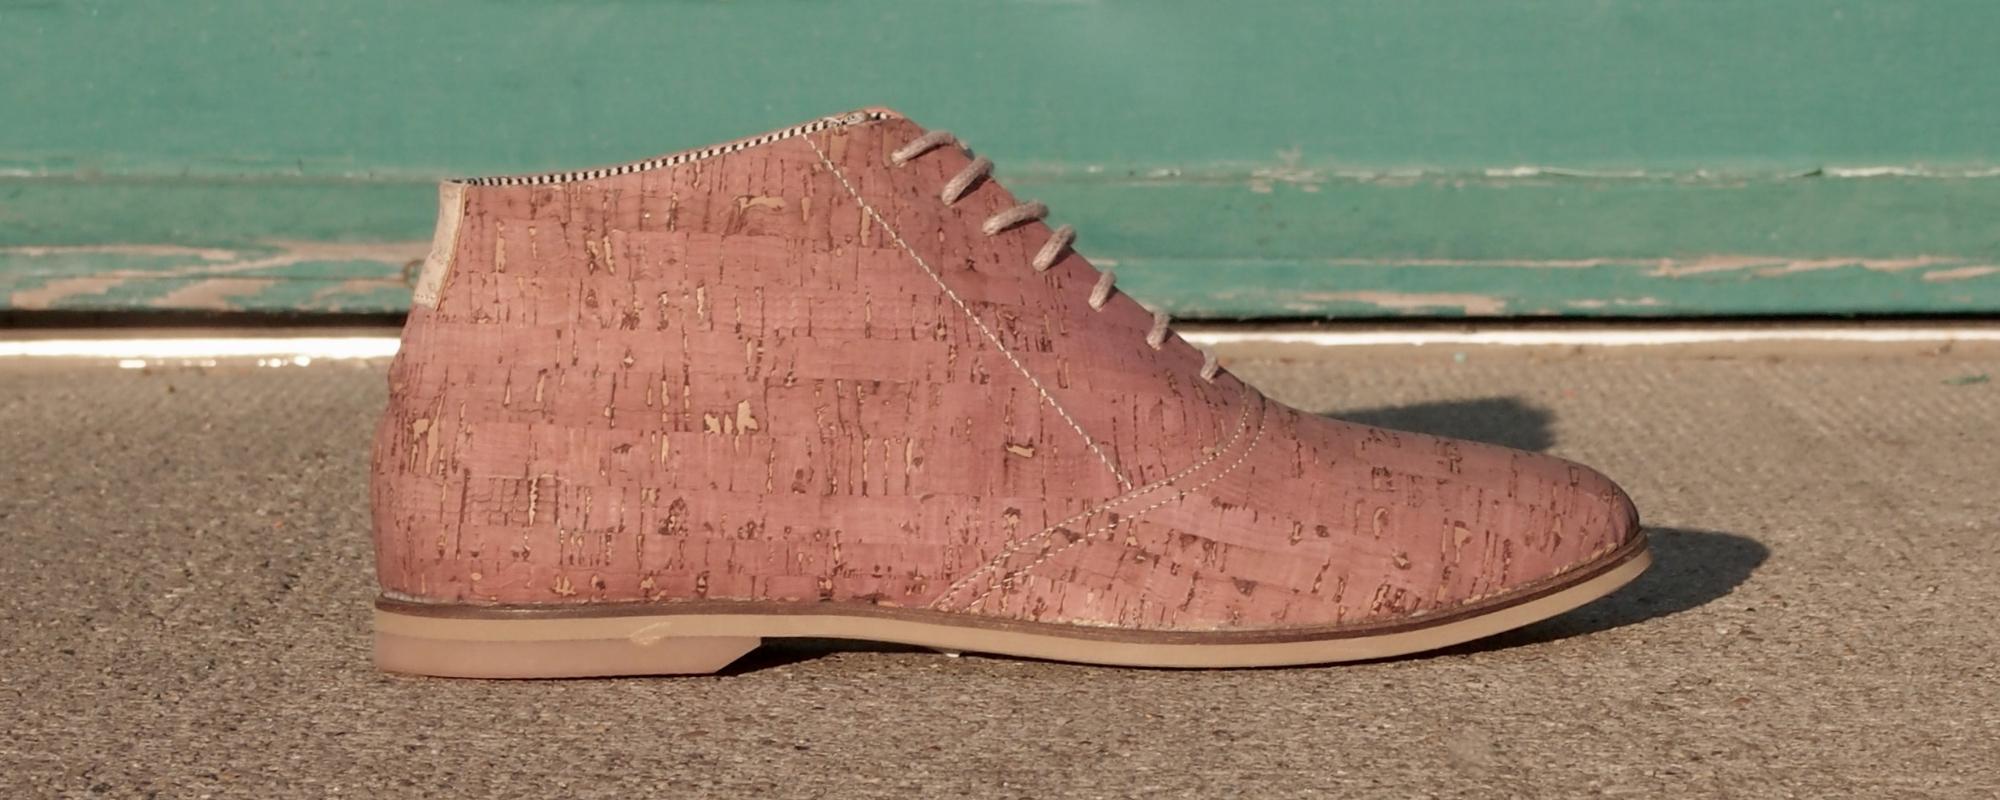 – Berlin Innovative Materialien SORBAS Shoes qVUMLzSpG